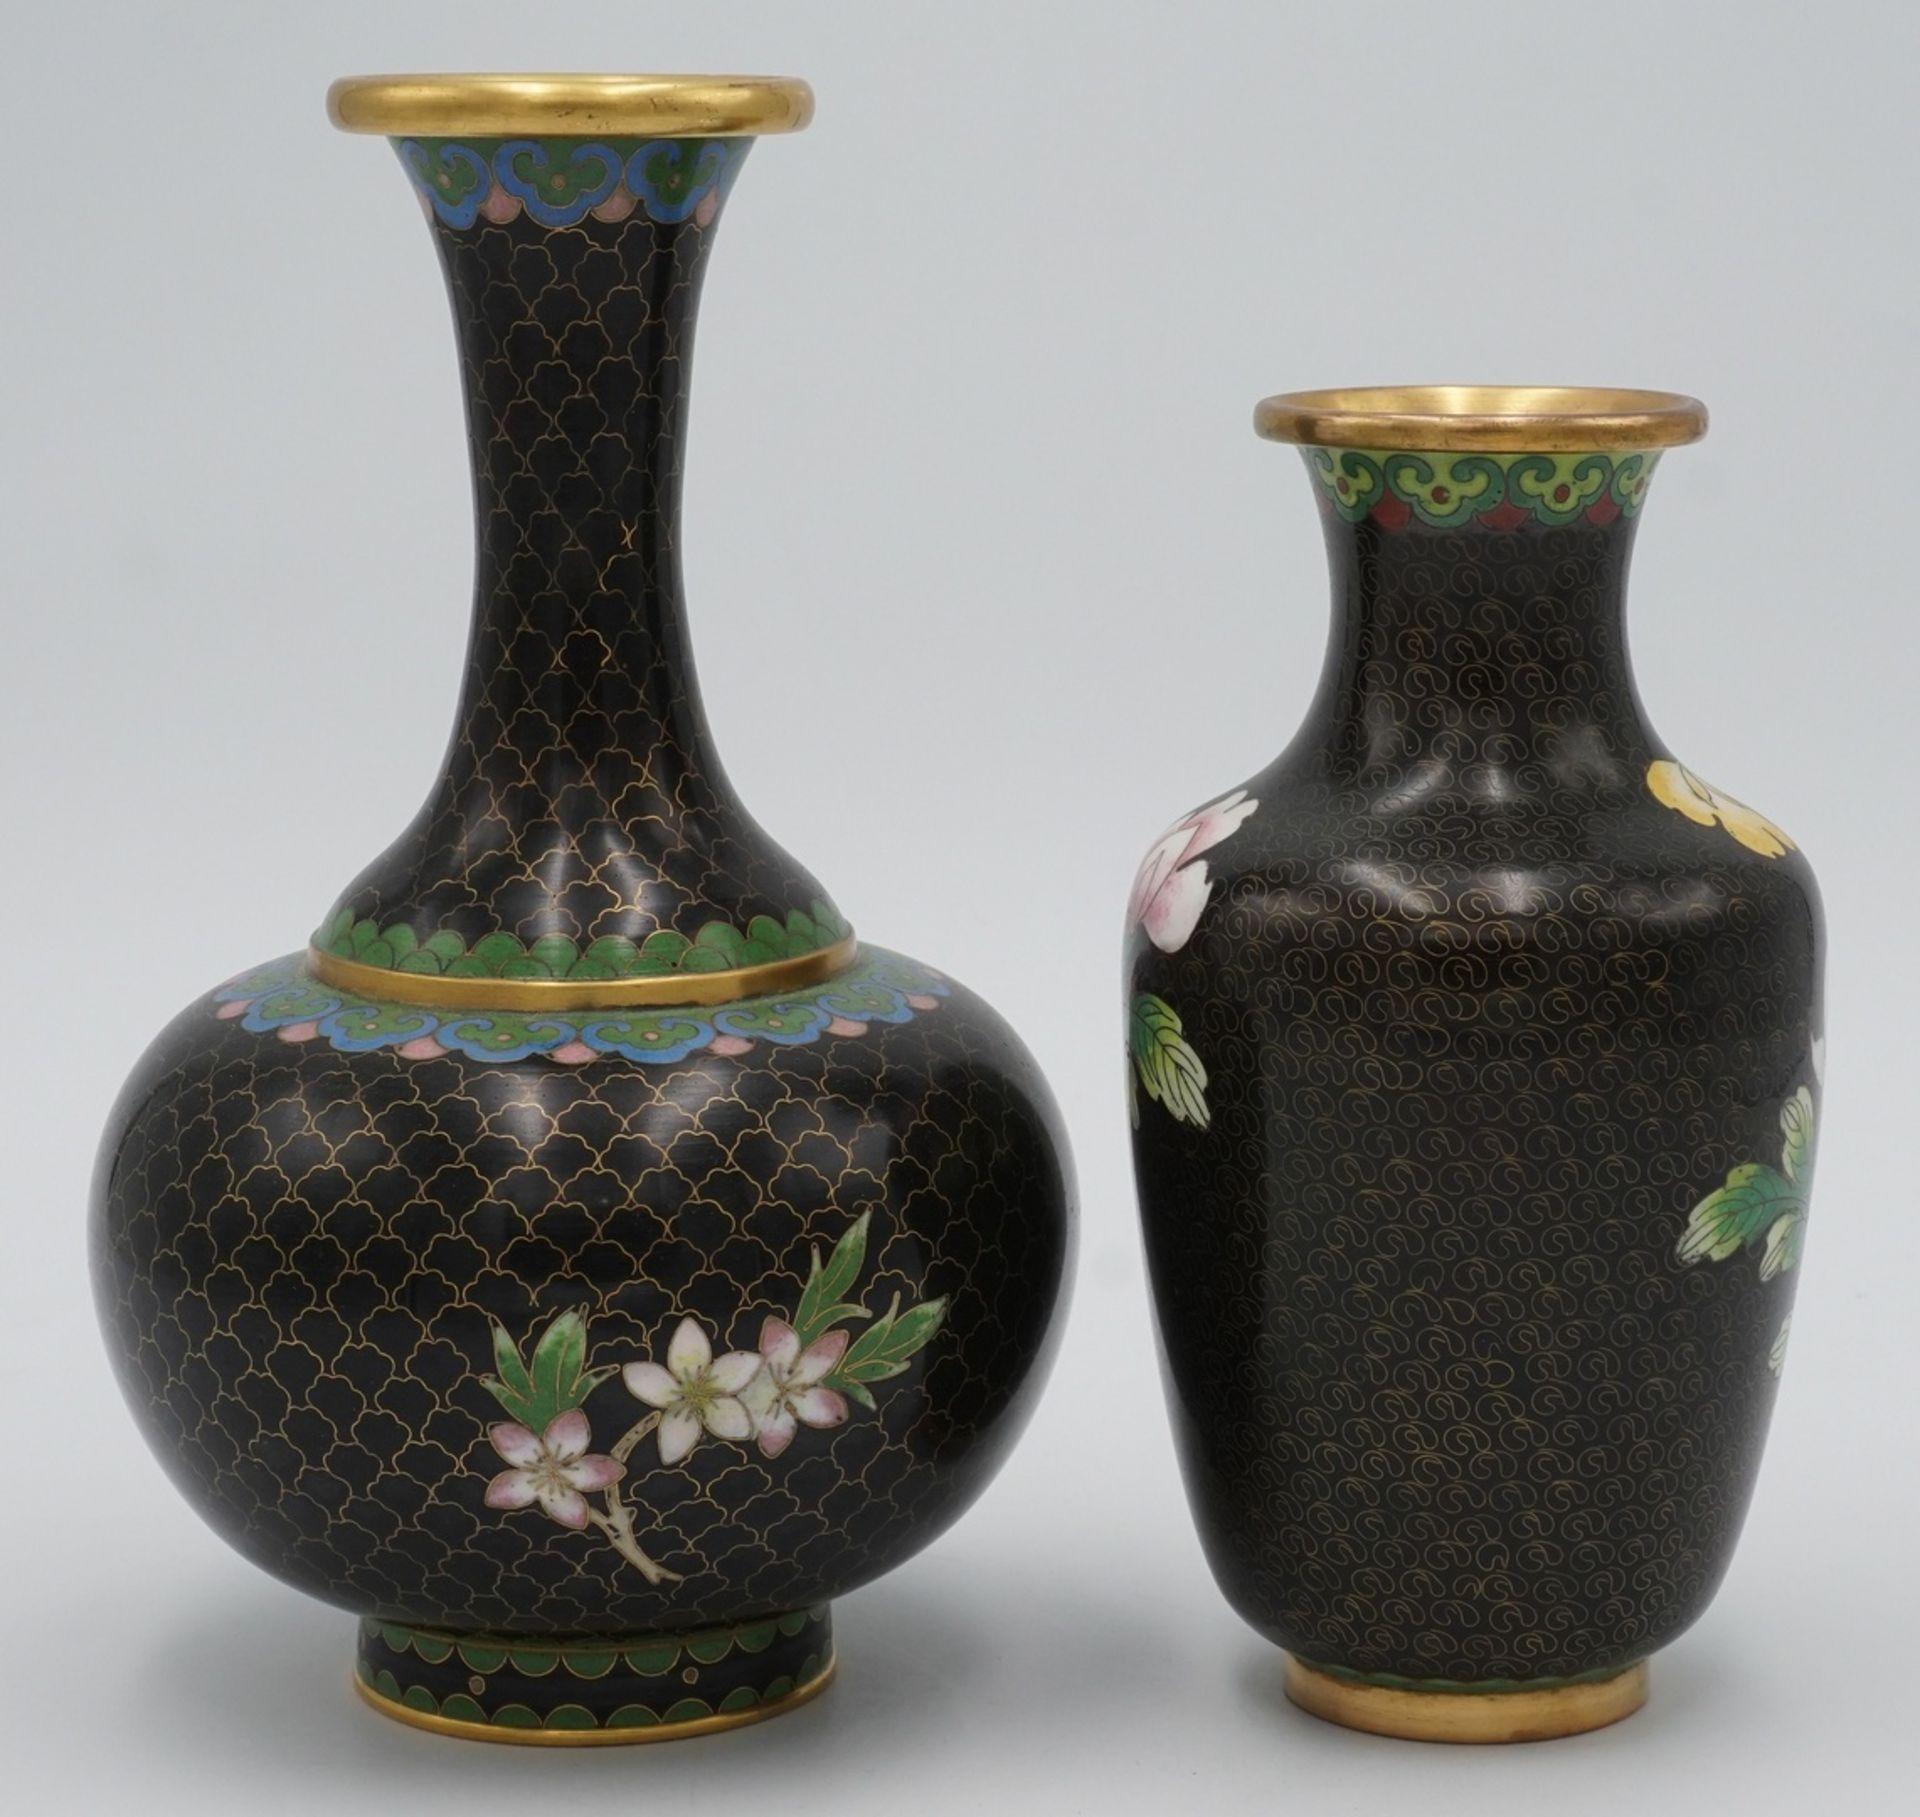 Zwei Cloisonné Vasen, China, 20. Jh. - Bild 2 aus 2